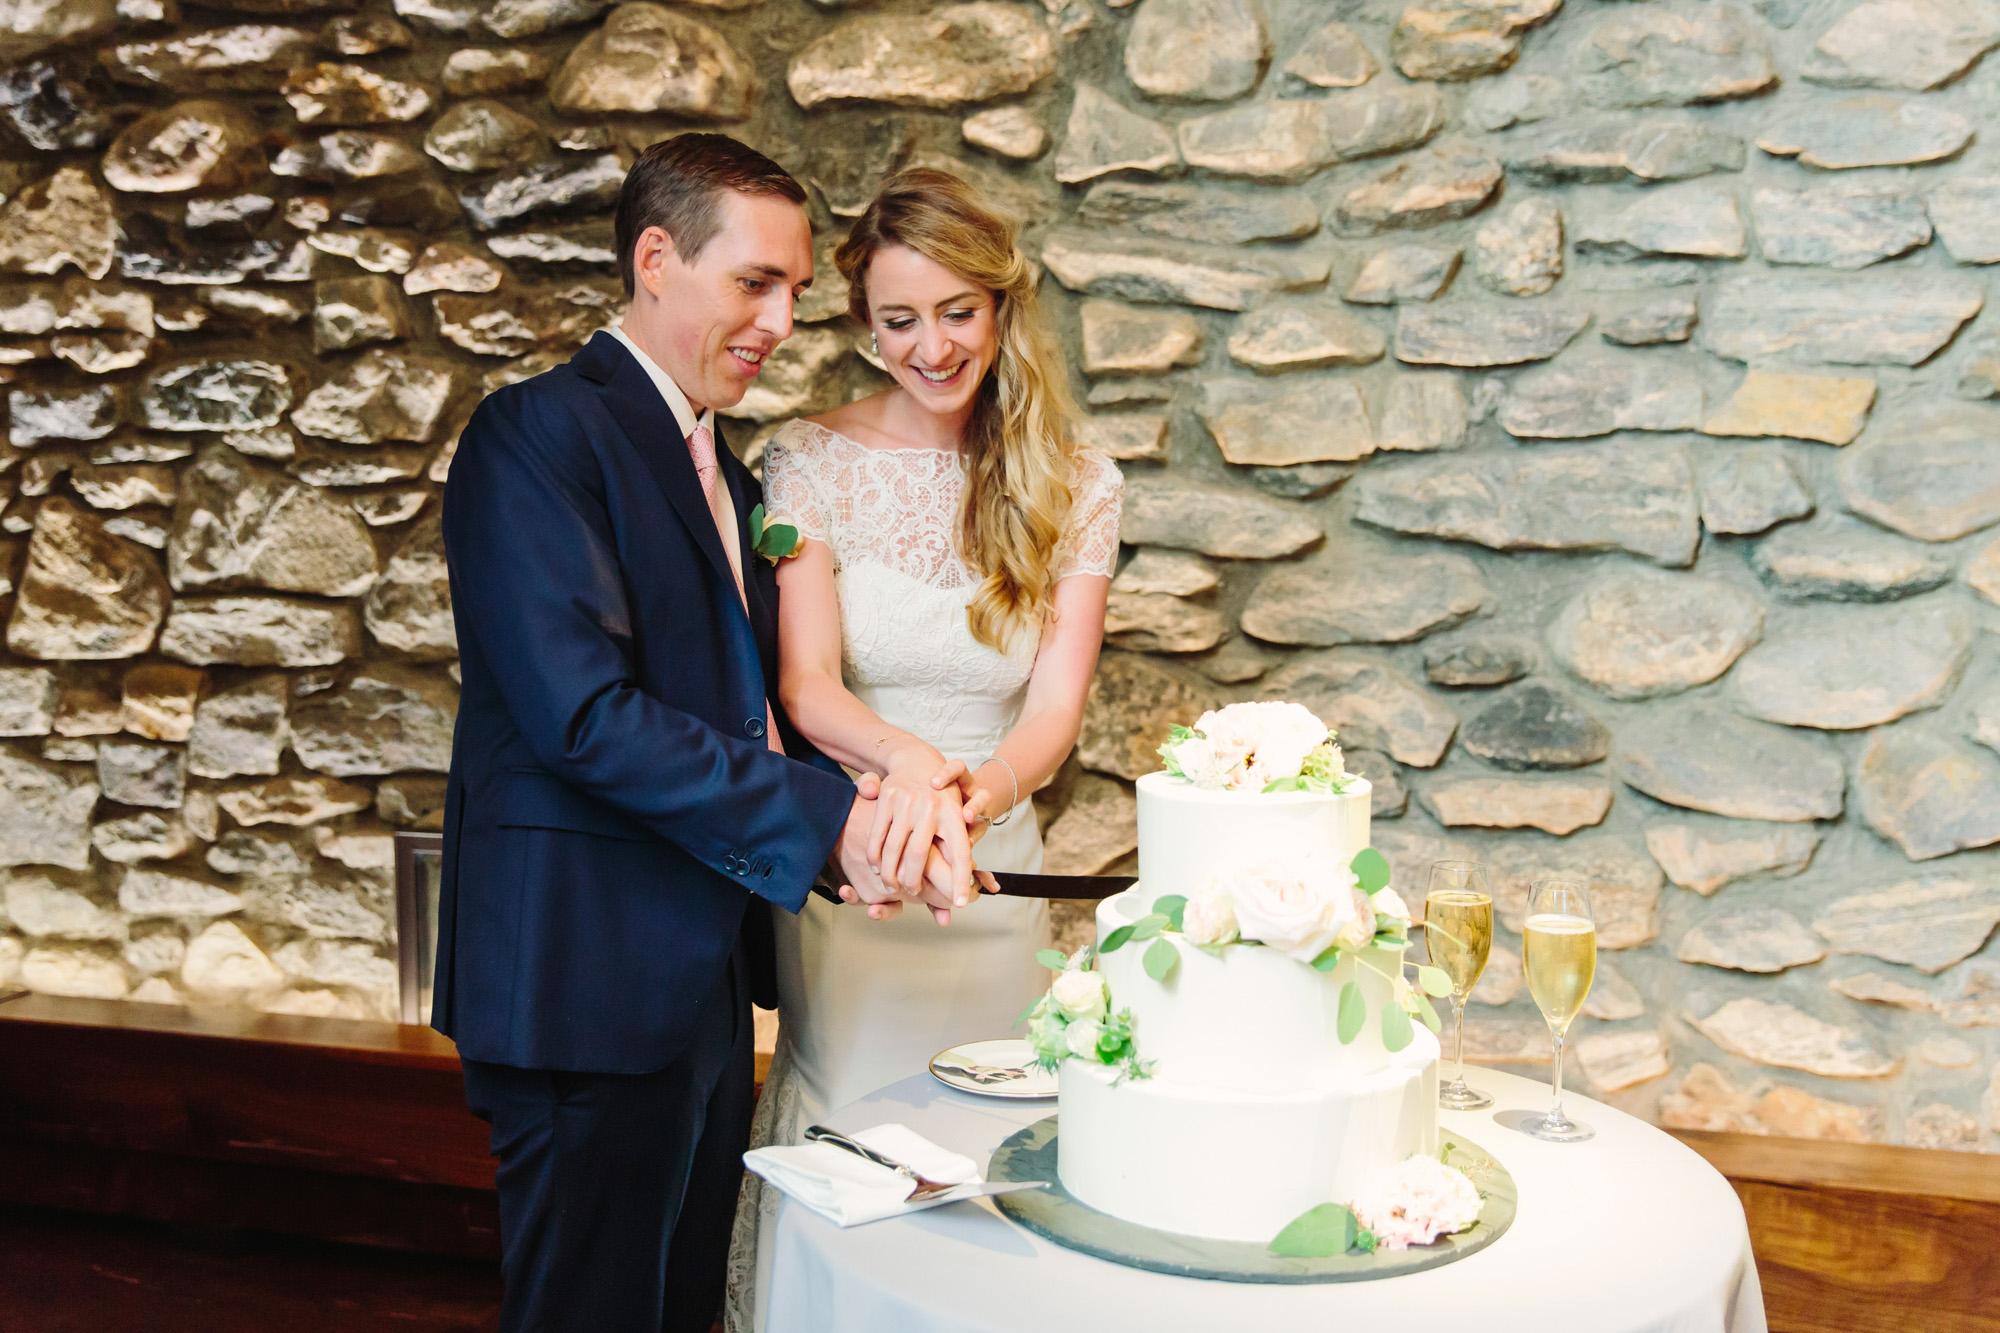 63_Jessica_Ted_Blue_Hill_Stone_Barns_Wedding_Pocantico_NY_Tanya_Salazar_Photography_179.jpg